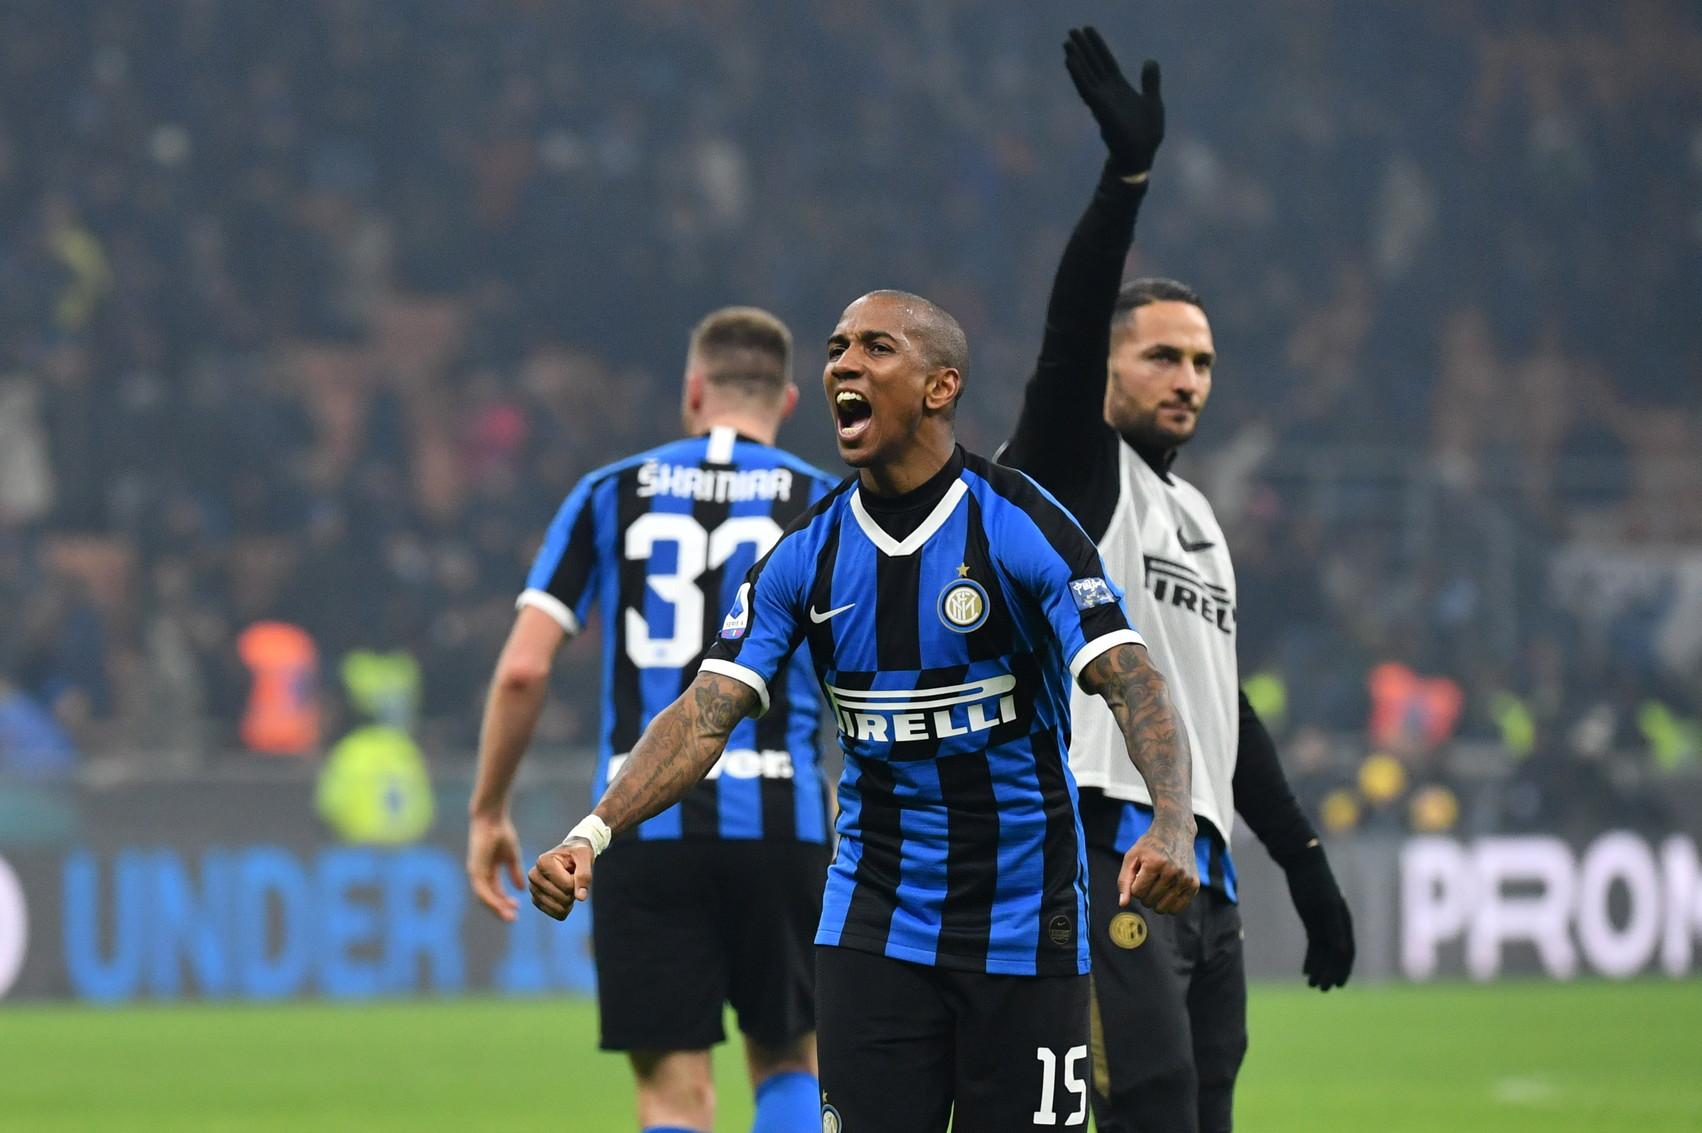 Inter: Young, Berni, Borja Valero, Padelli